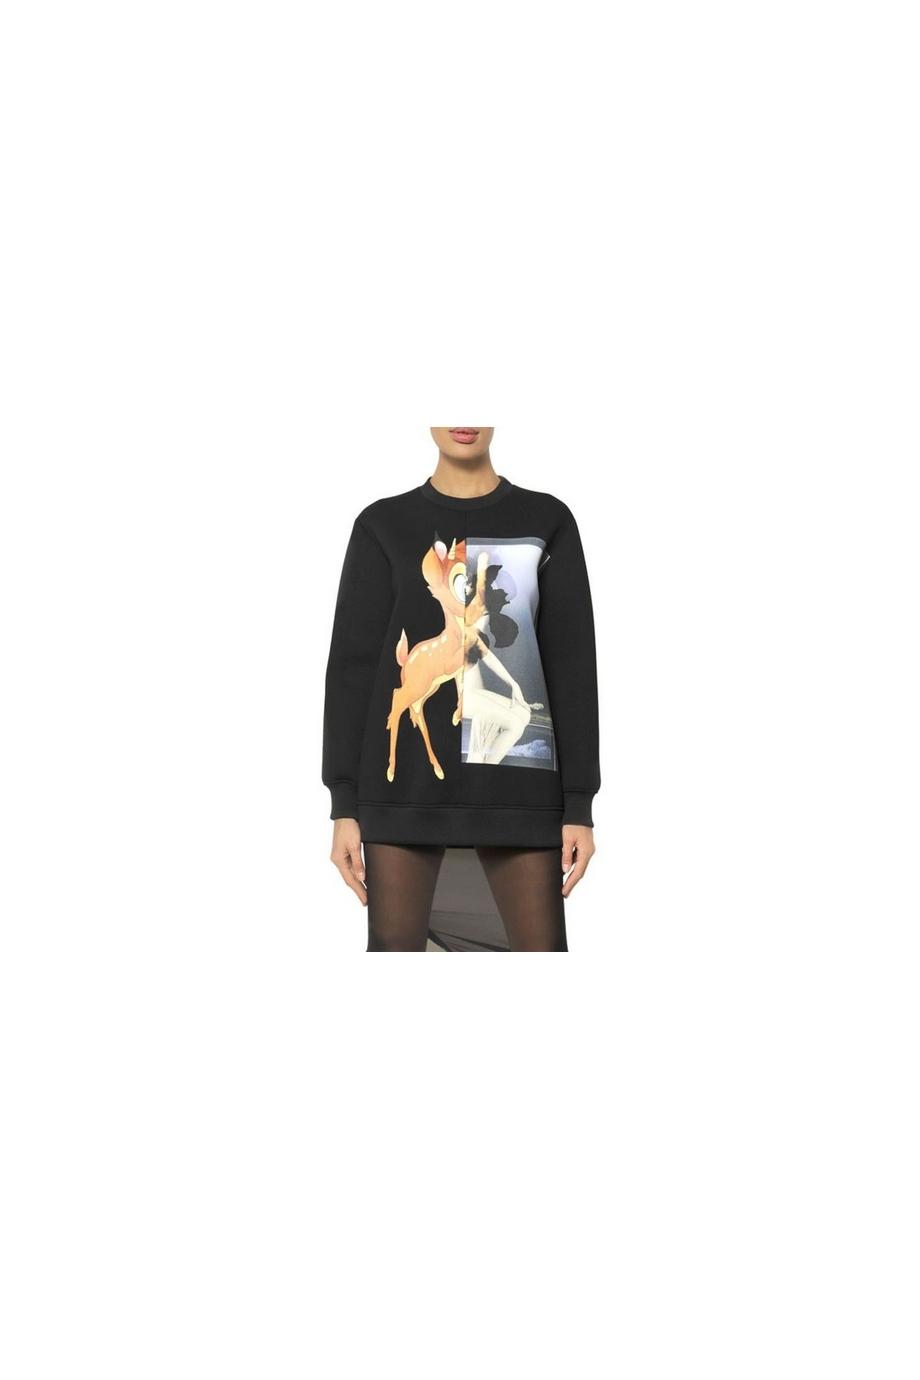 EBBA Bambi Pattern Spliced Top  Black  In Clothing   JESSICABUURMAN [7752] - $75.00 : JESSICABUURMAN.COM